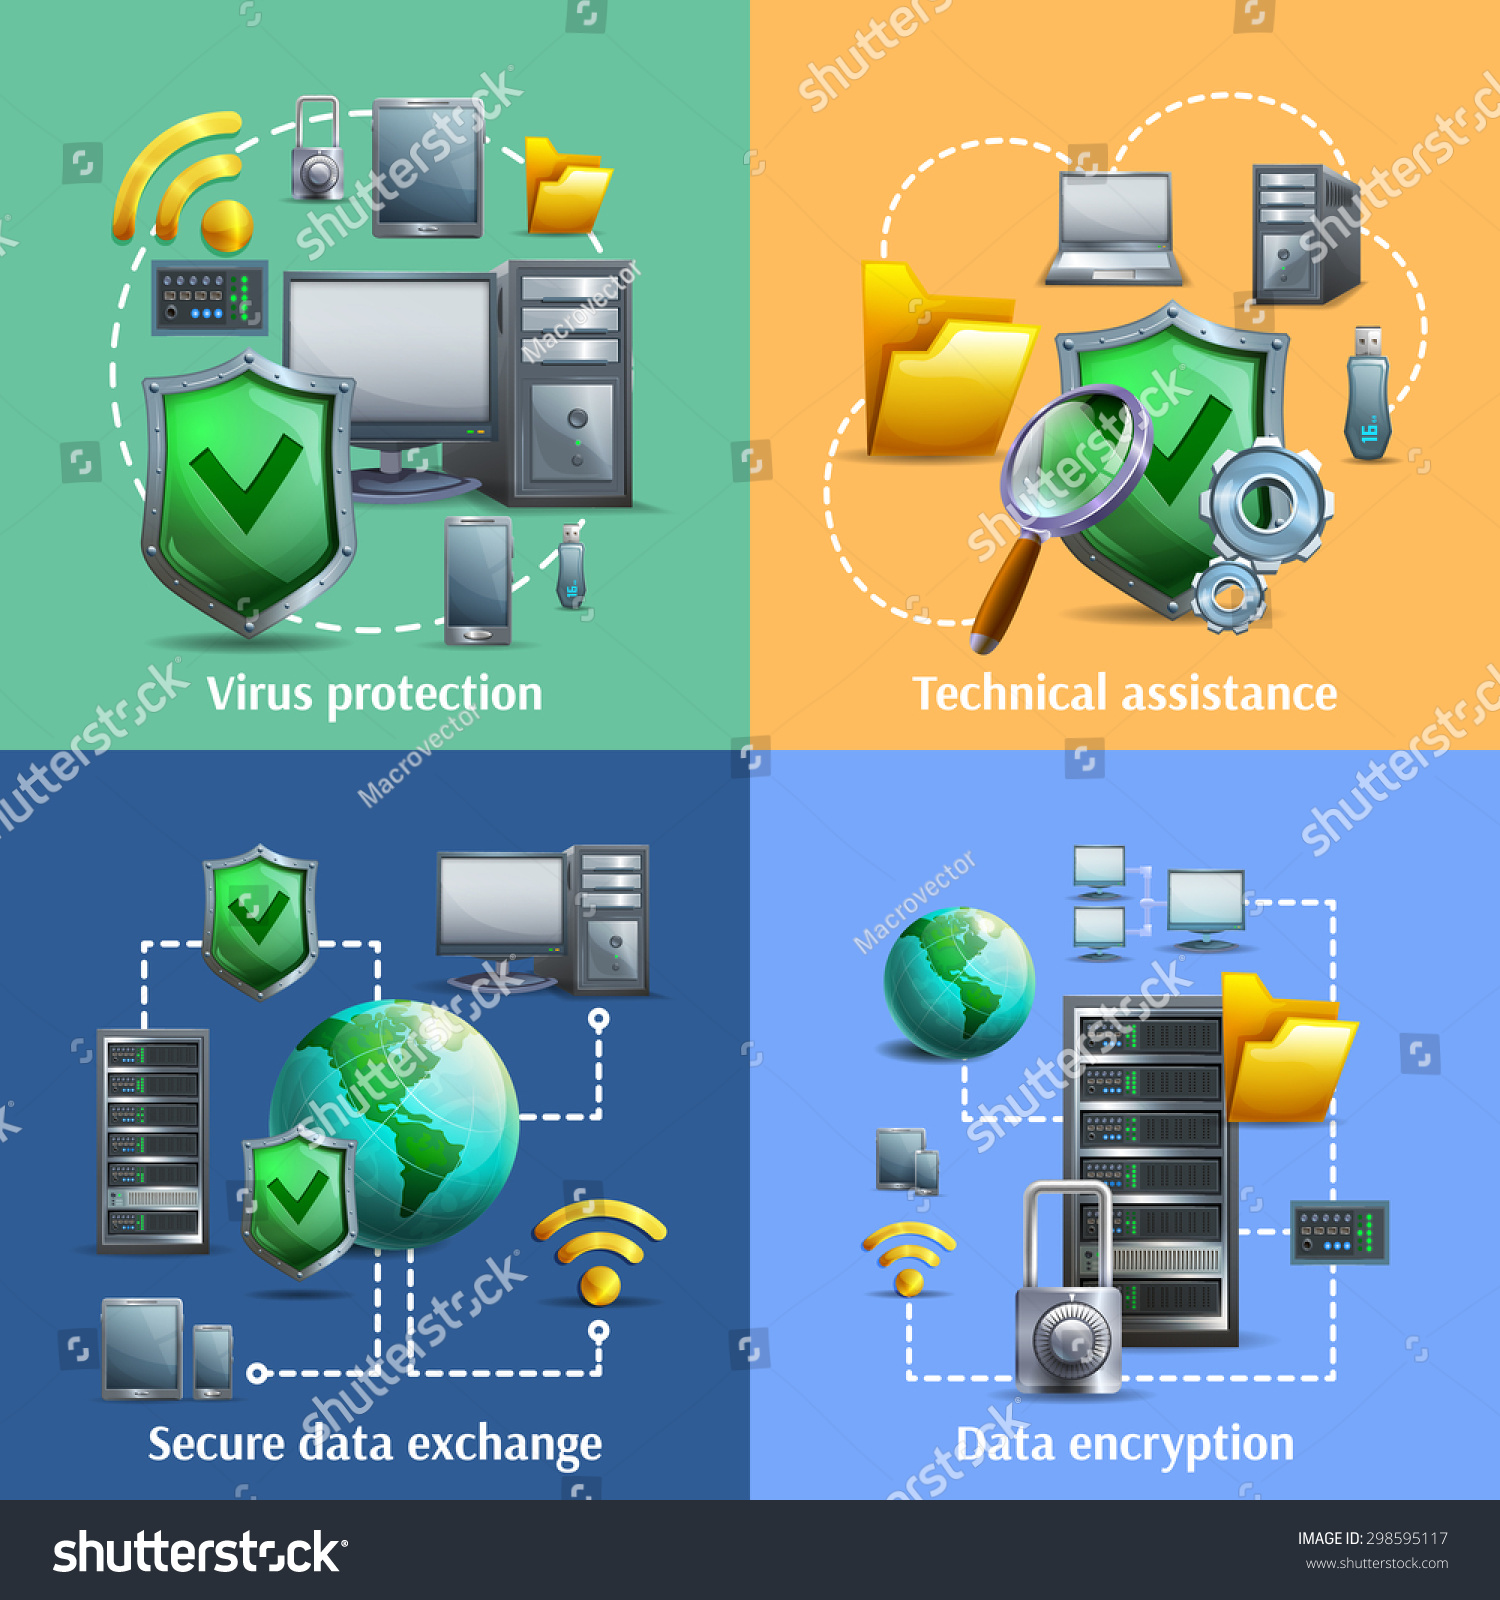 Security Encryption: Data Encryption Security Exchange Cartoon Icons Stock